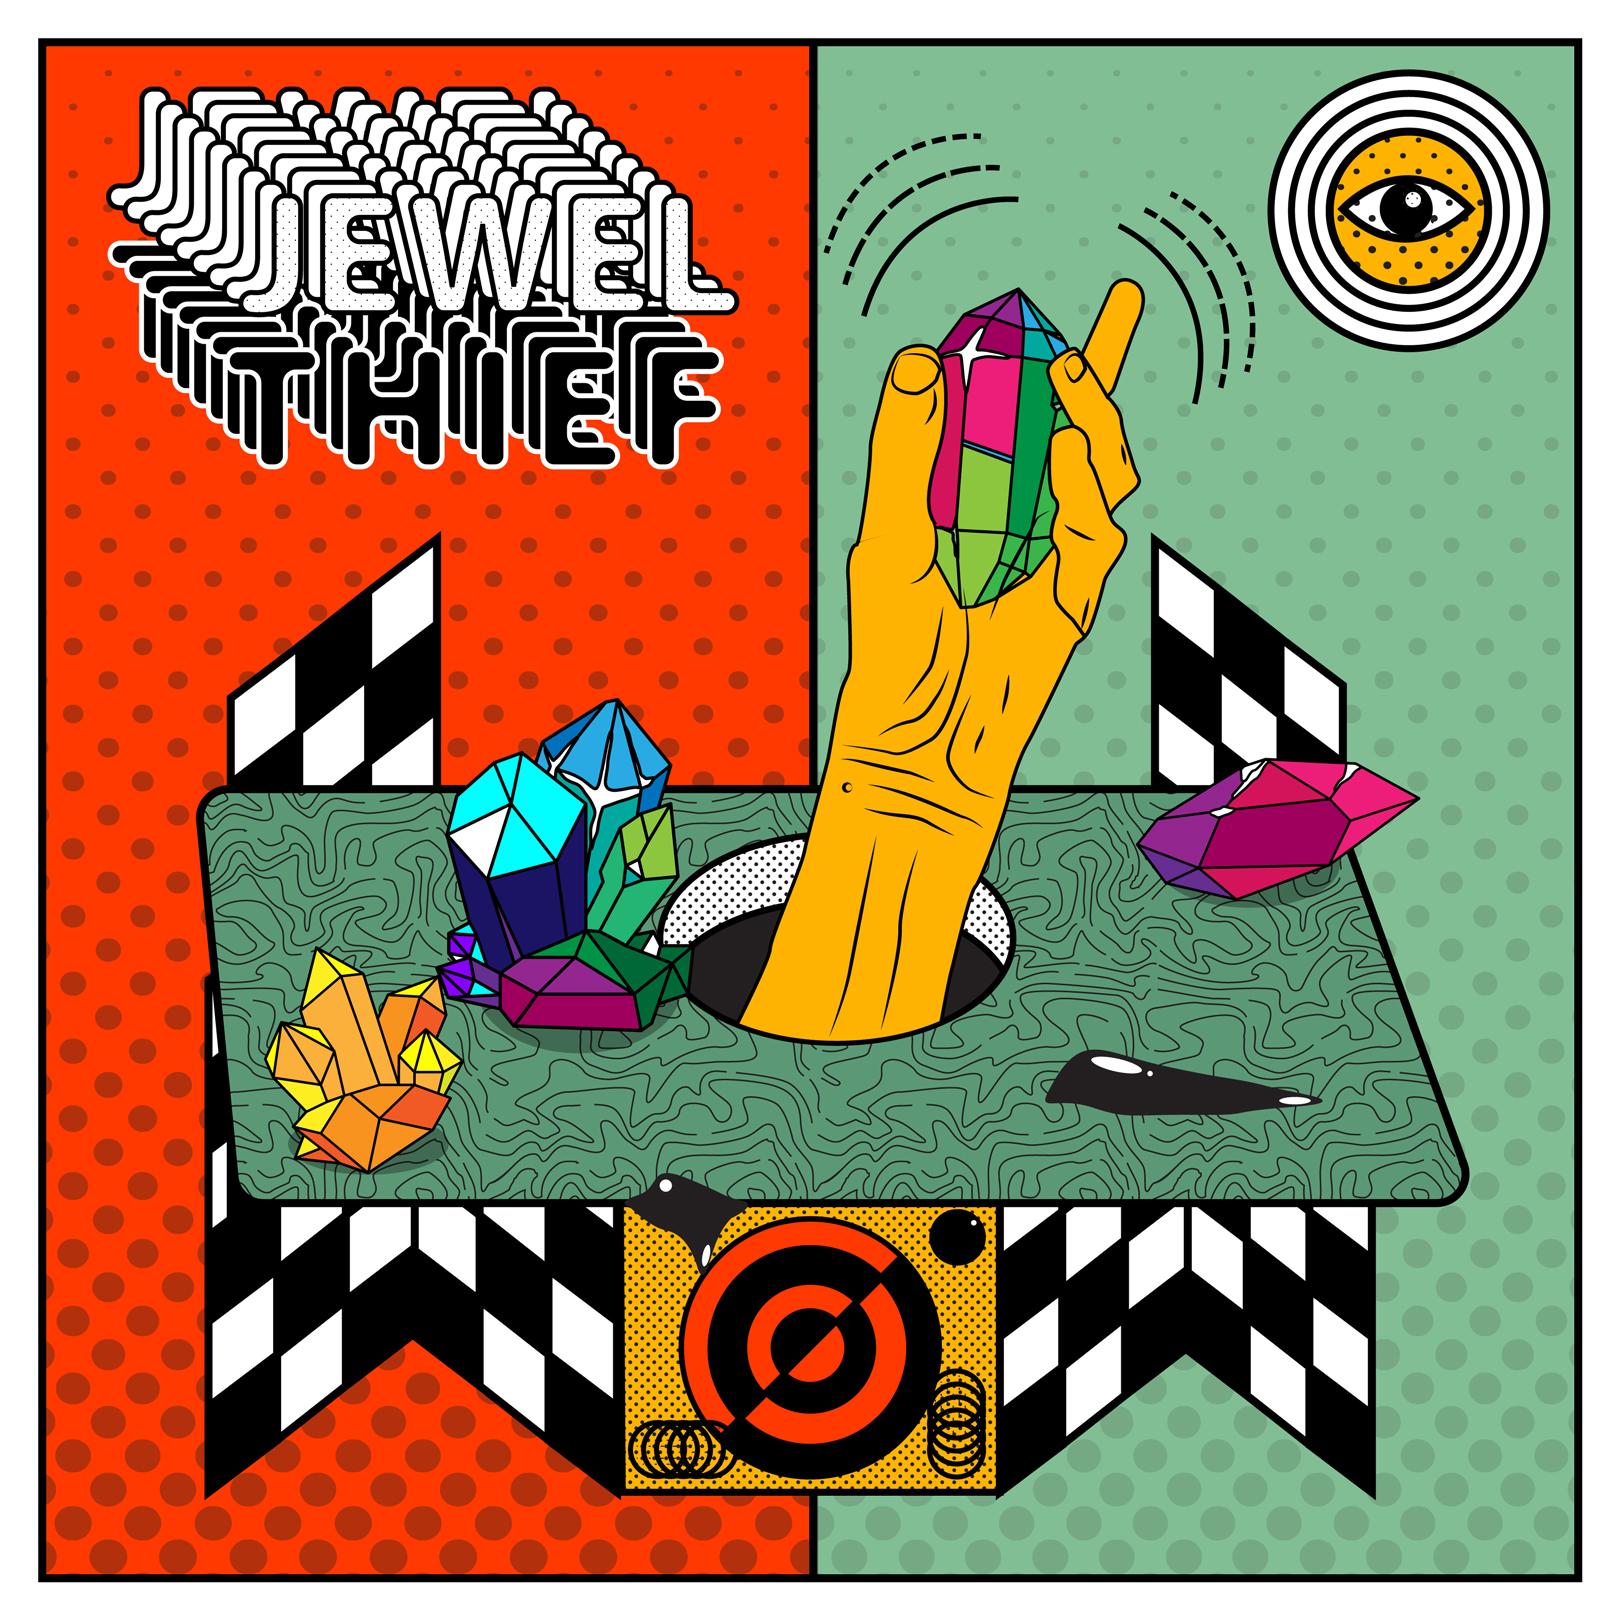 Jewel-Thief-(1967)-album-art.jpg